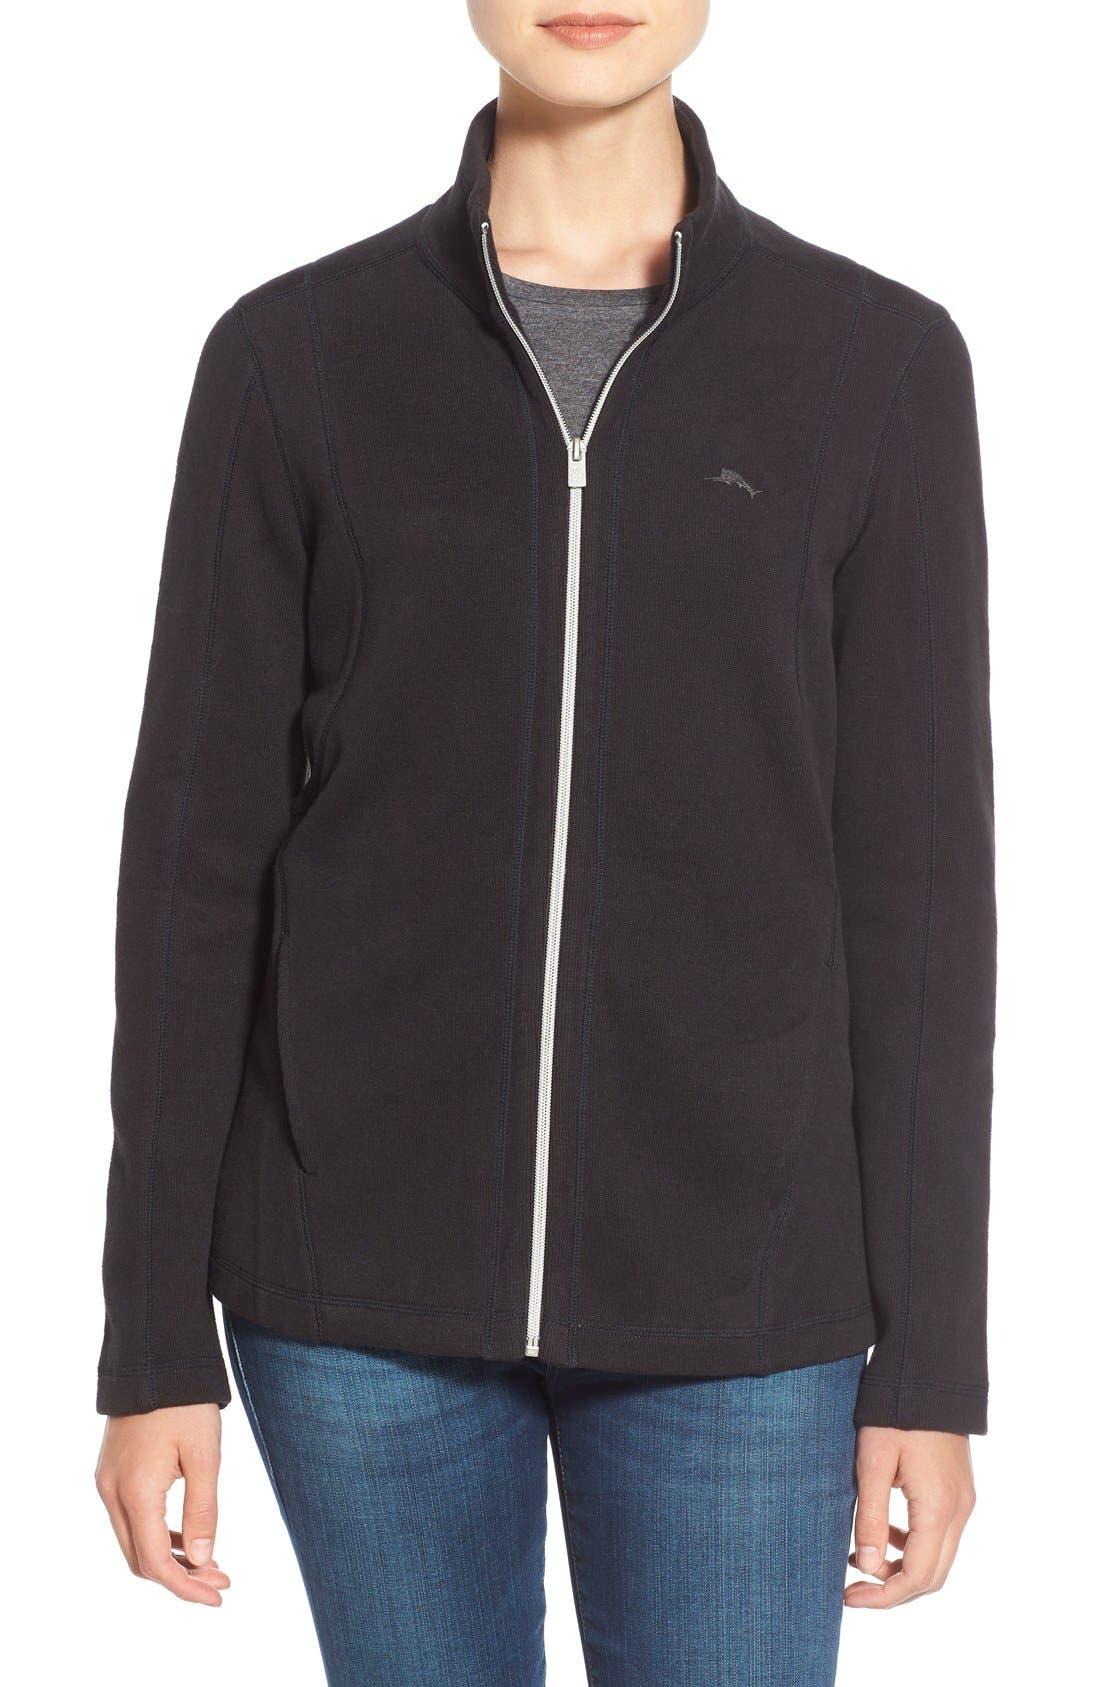 'Aruba' Full Zip Sweatshirt,                         Main,                         color,